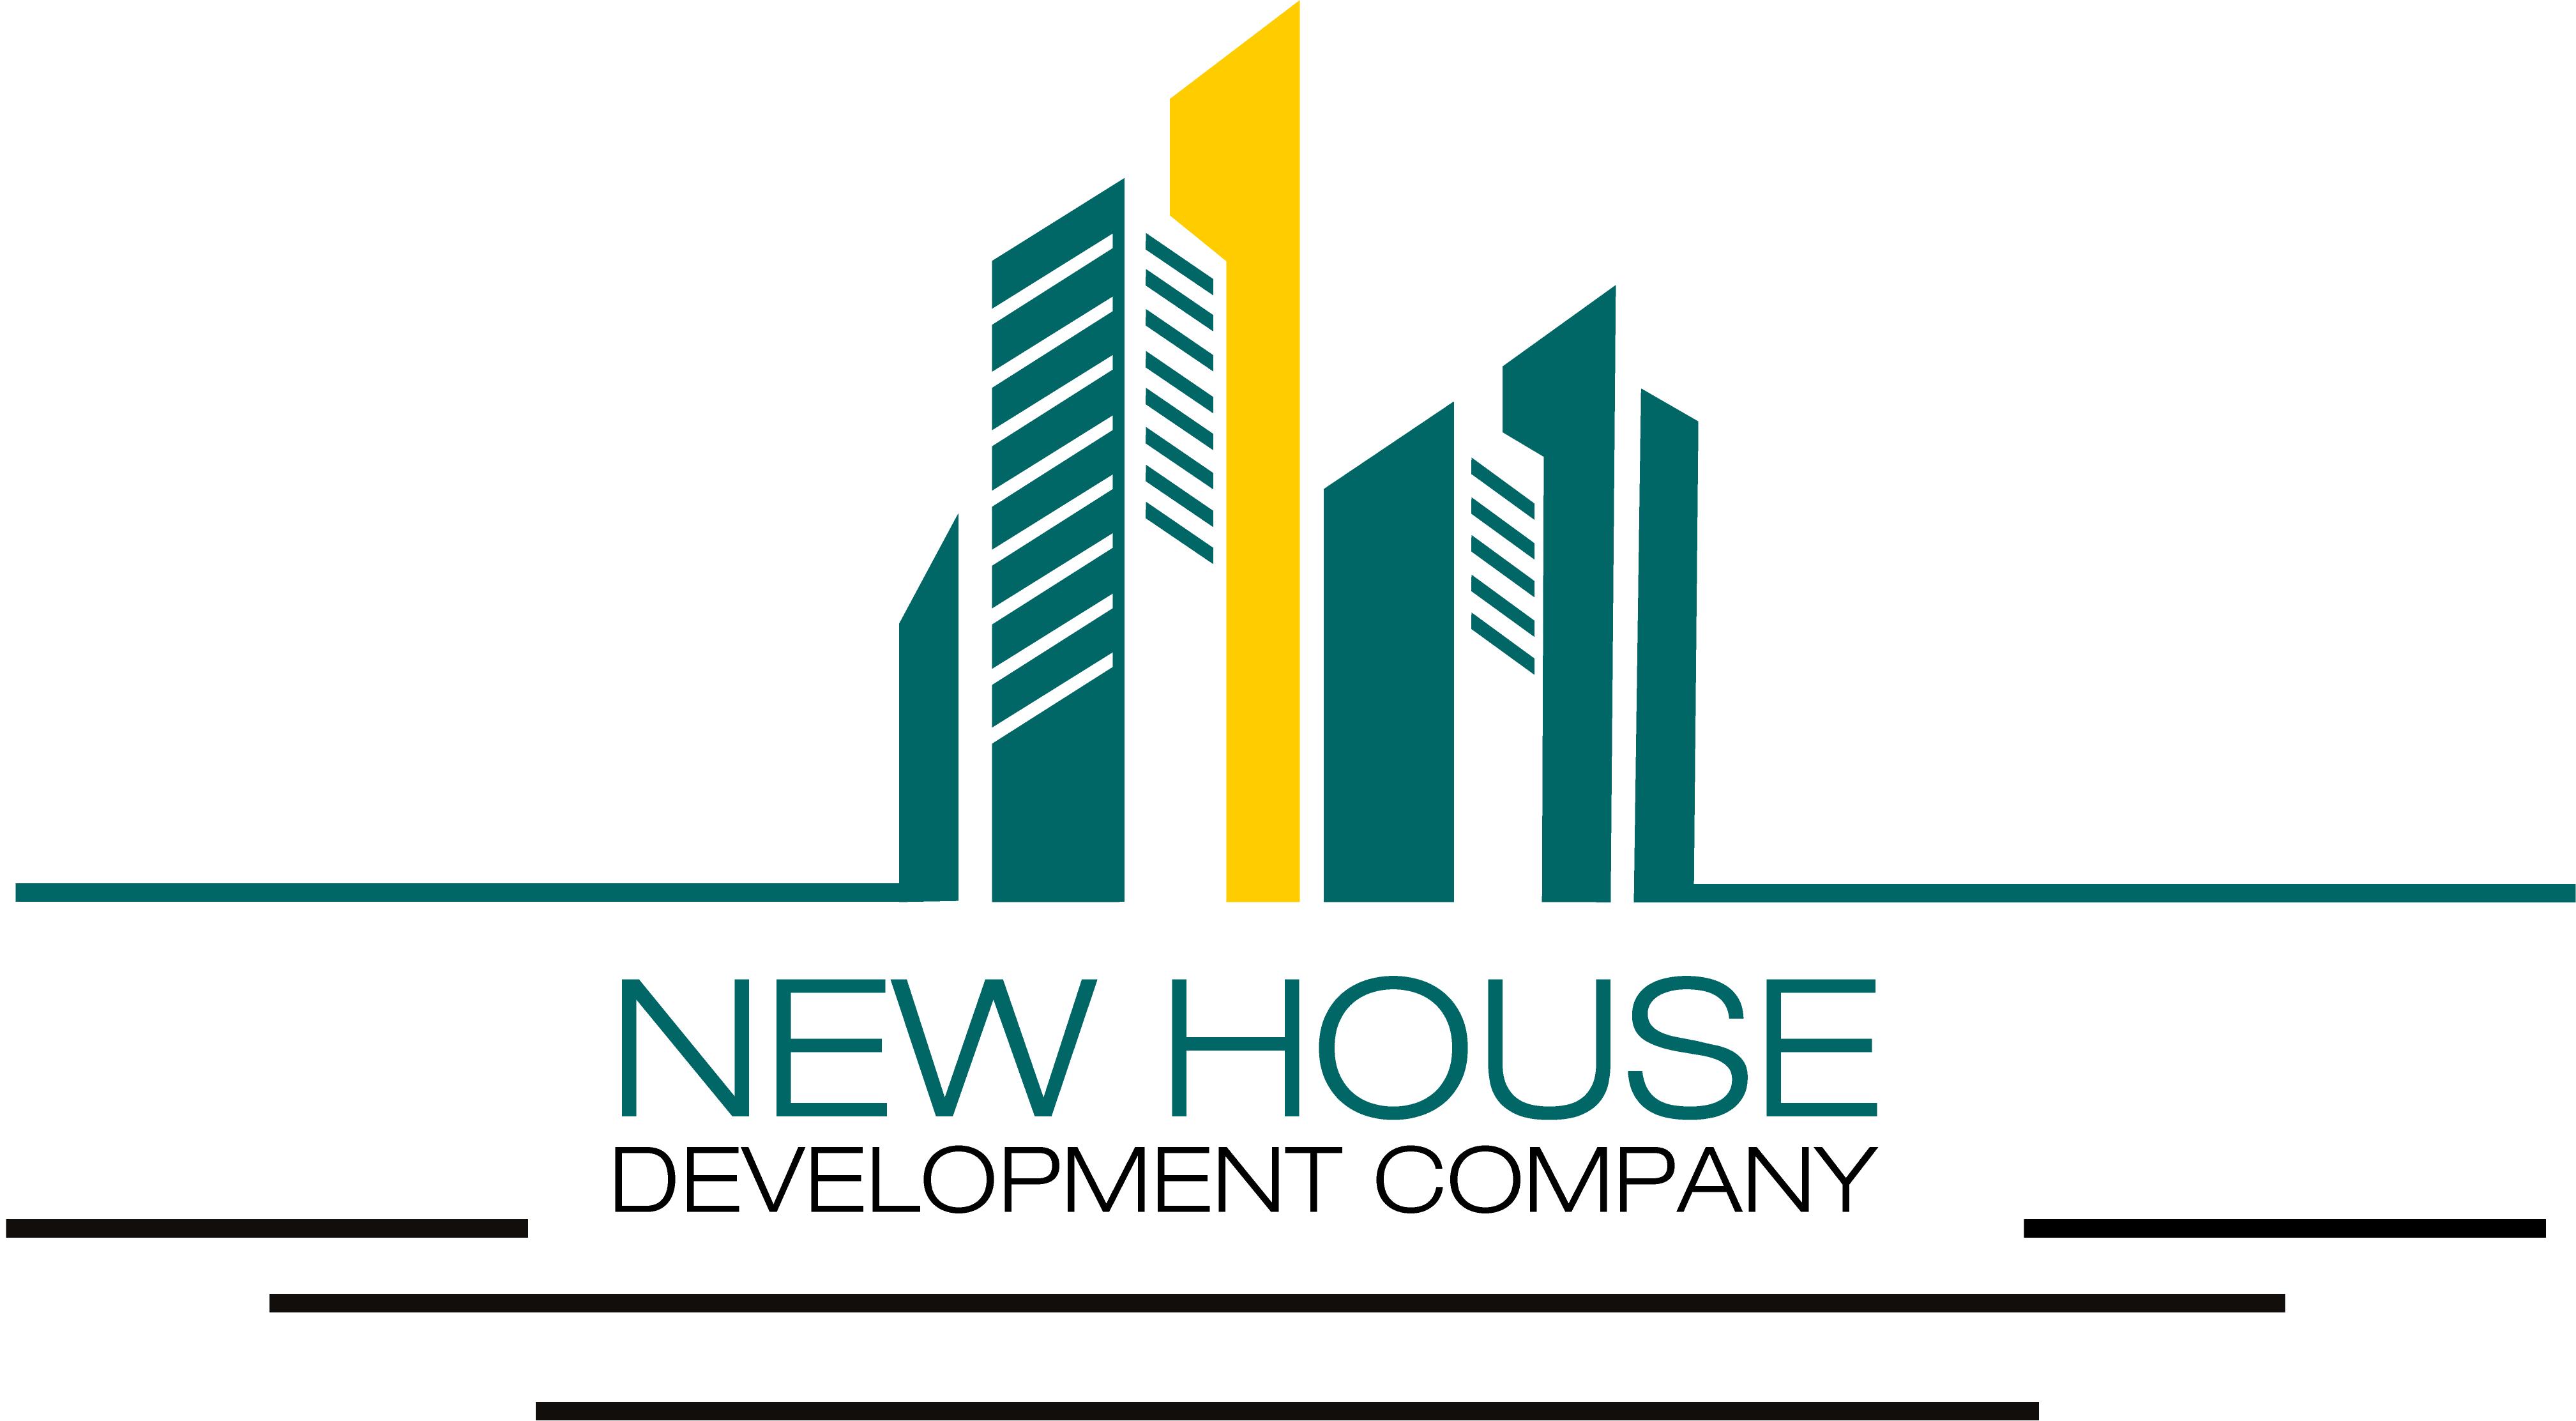 New House Development Company